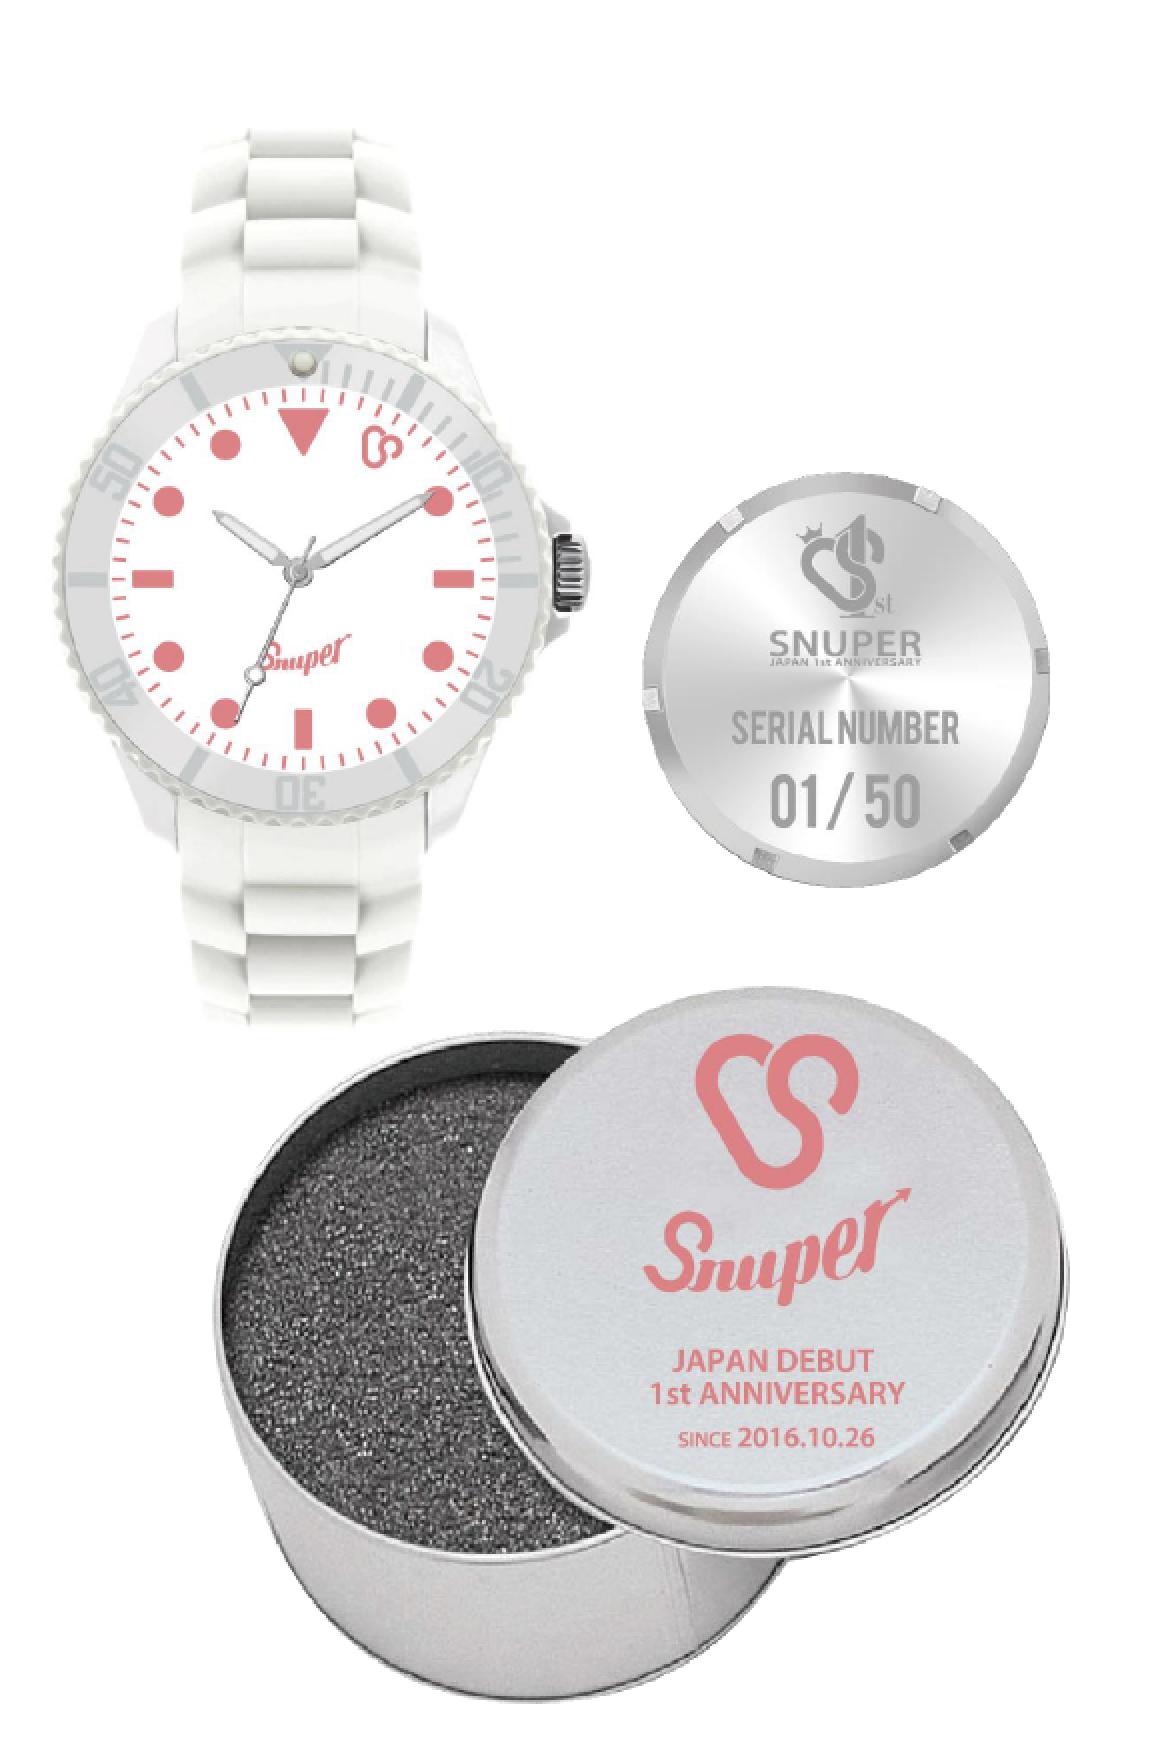 SNUPER日本デビュー1周年記念ウォッチ(「SWING JAPAN」会員様限定先着販売)【予約】